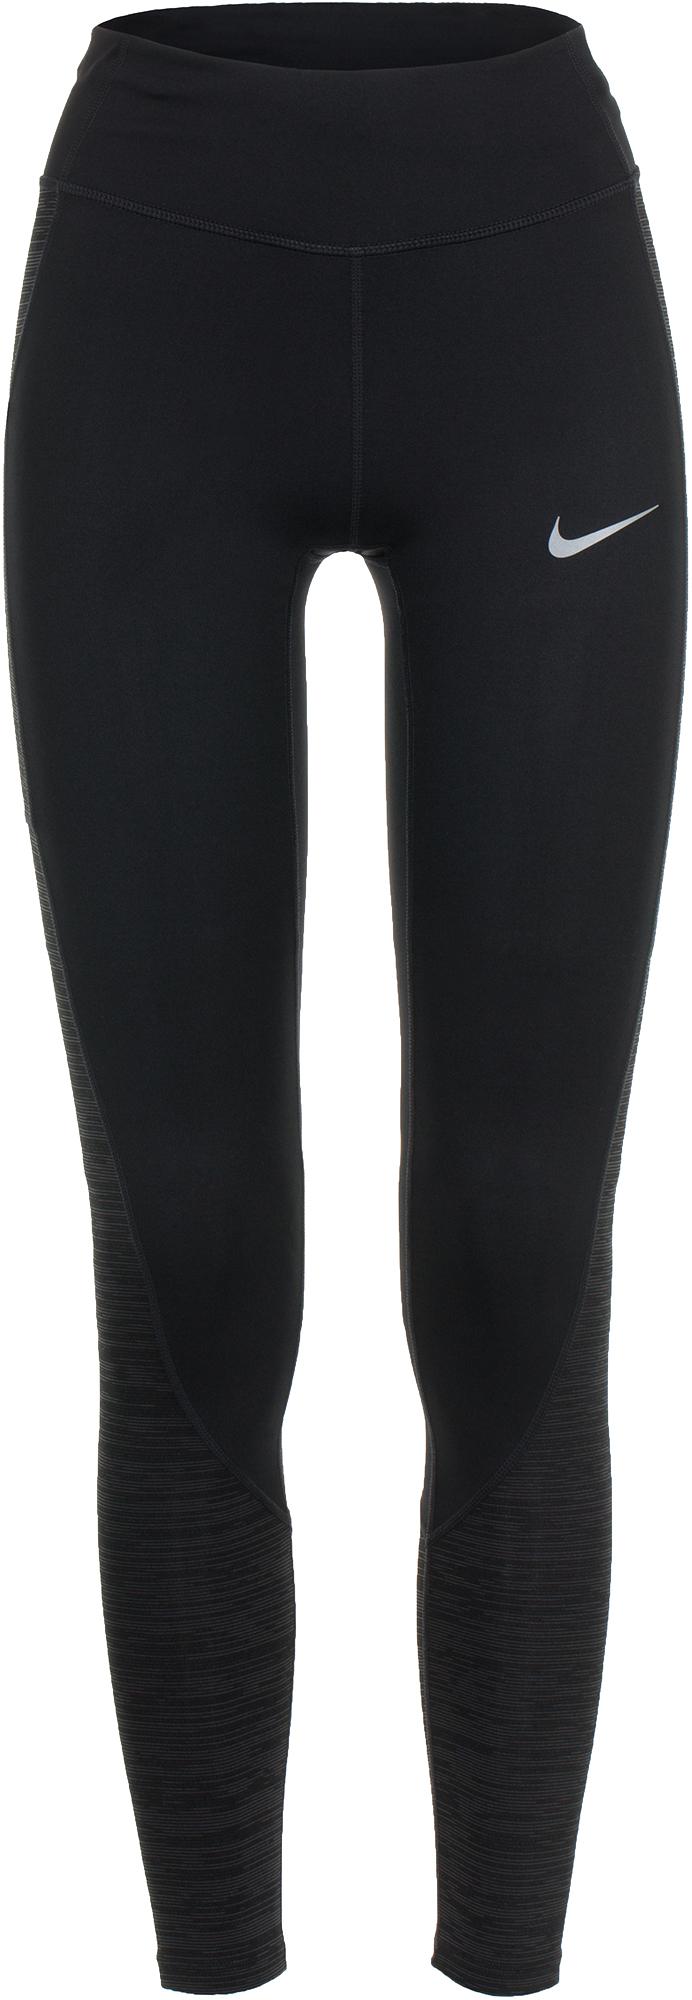 Nike Легинсы женские Racer Warm, размер 48-50